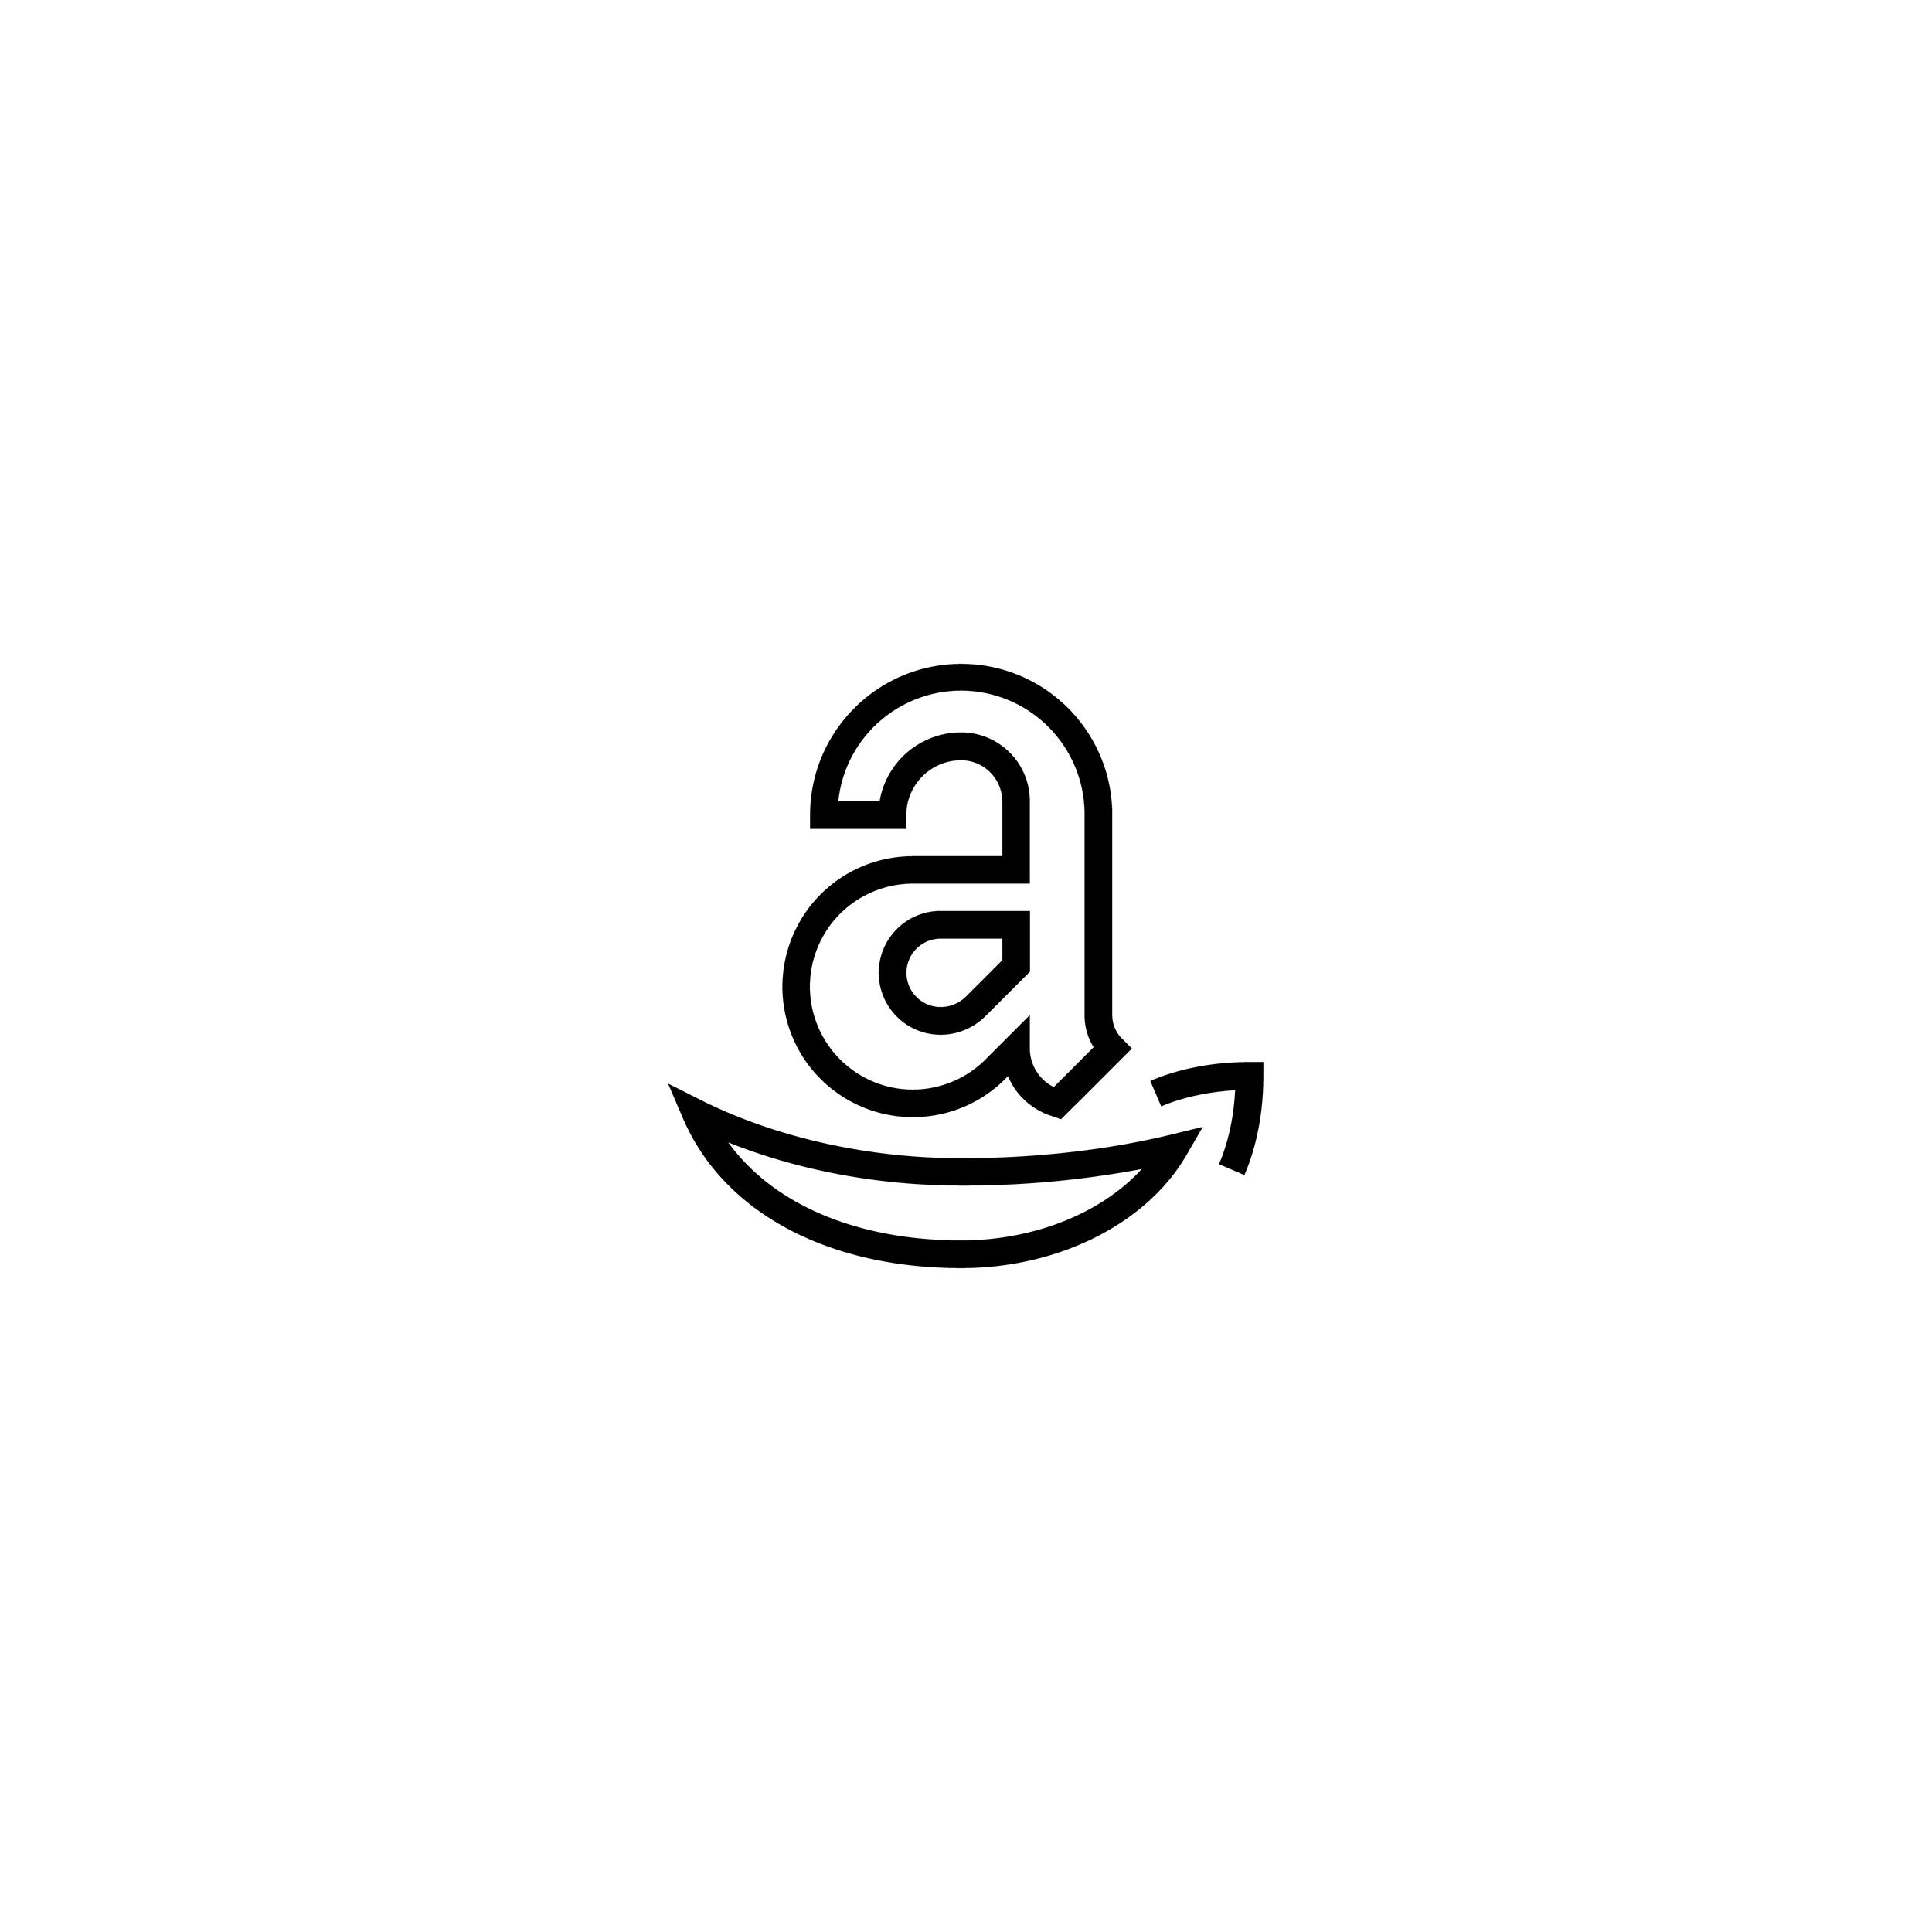 amazon-services(services)-01.png